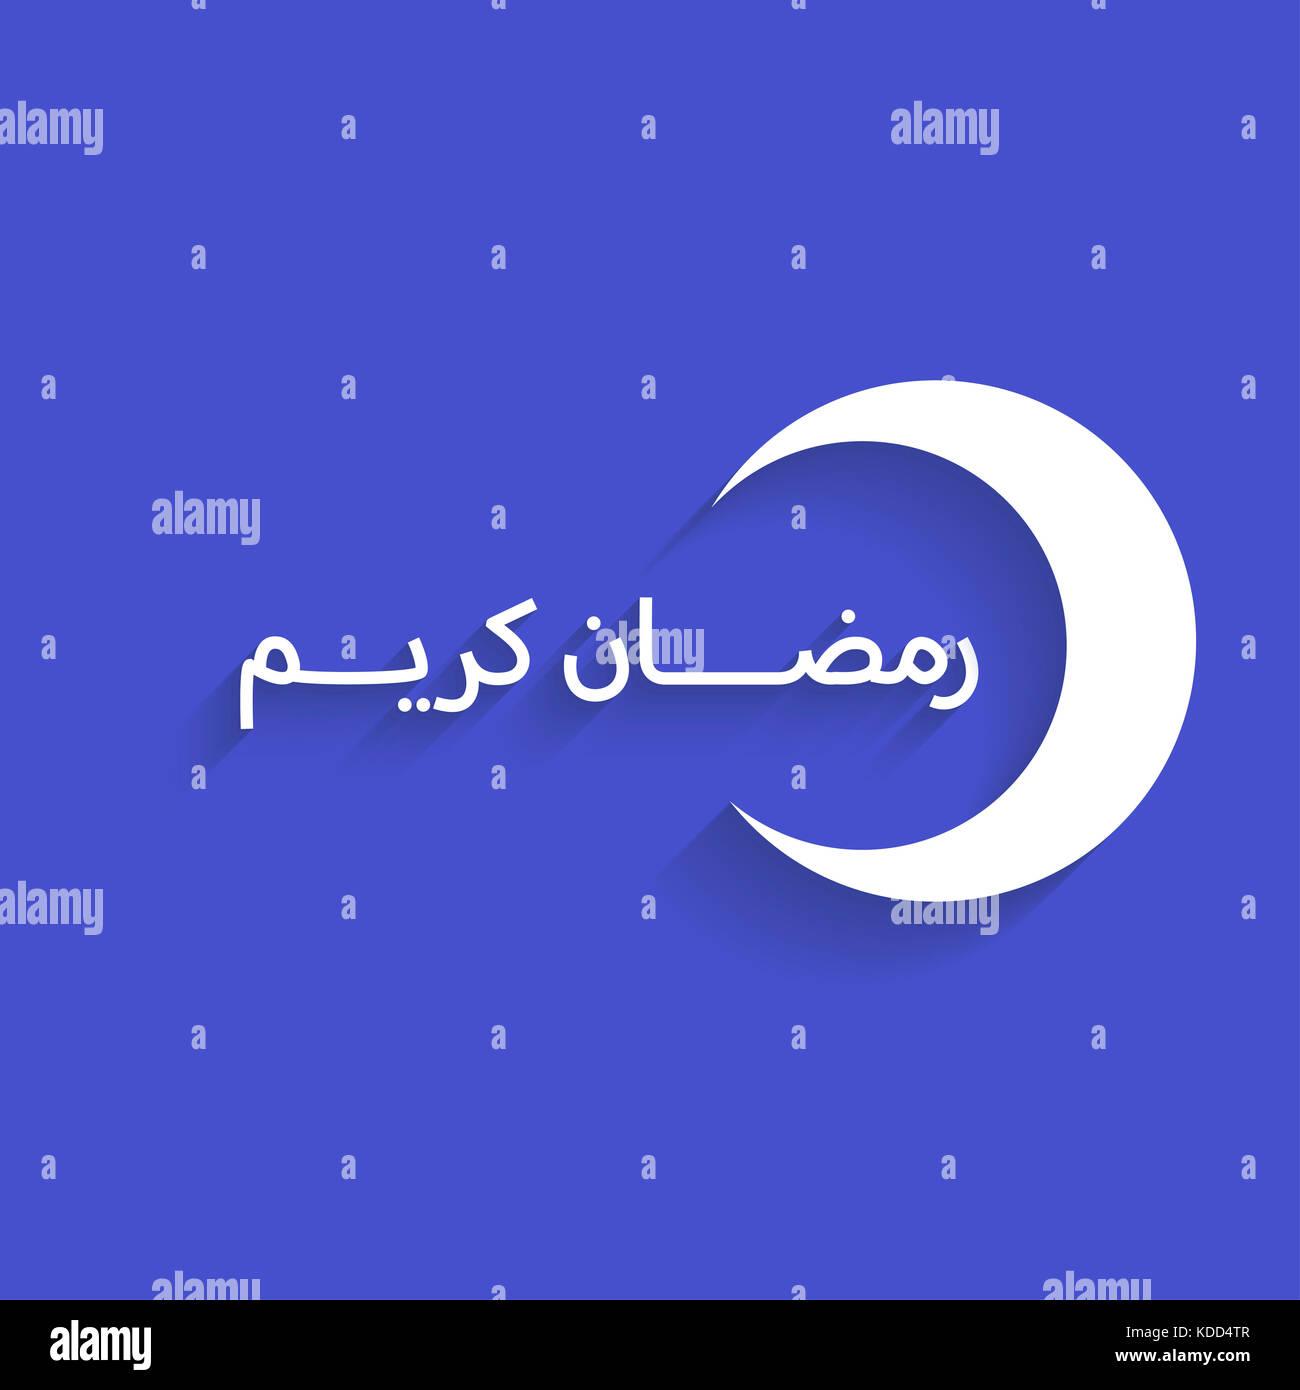 Arabic alphabet stock photos arabic alphabet stock images alamy ramadan kareem creative line typography arabic alphabet stock image biocorpaavc